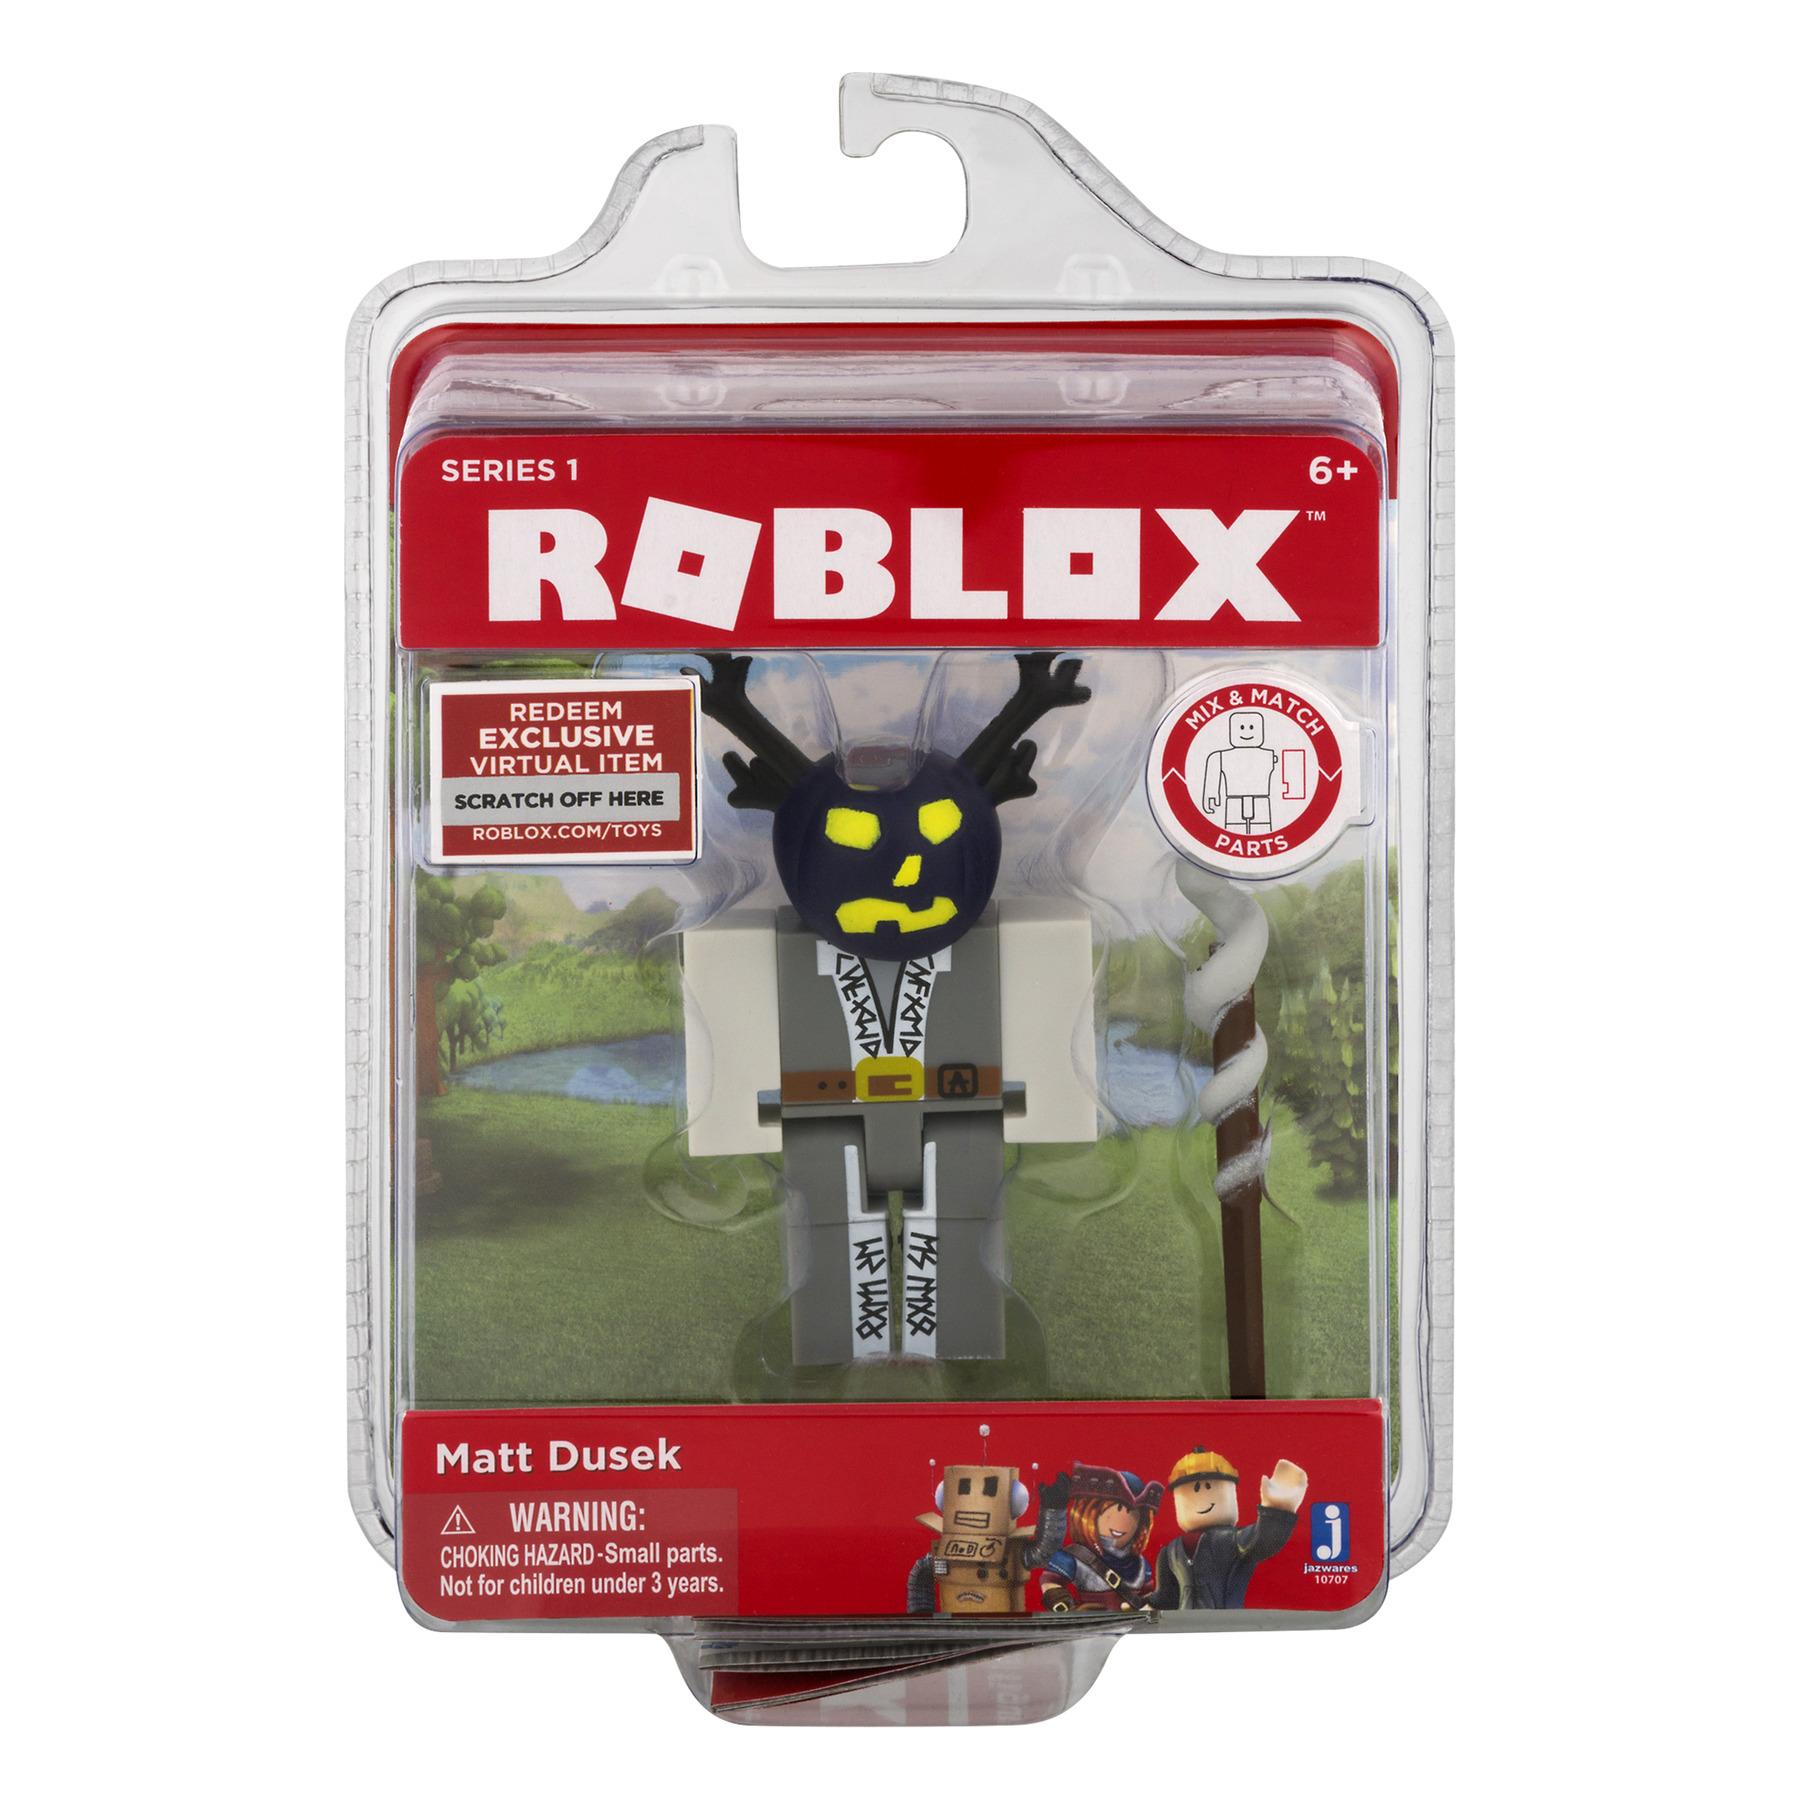 Brand Roblox